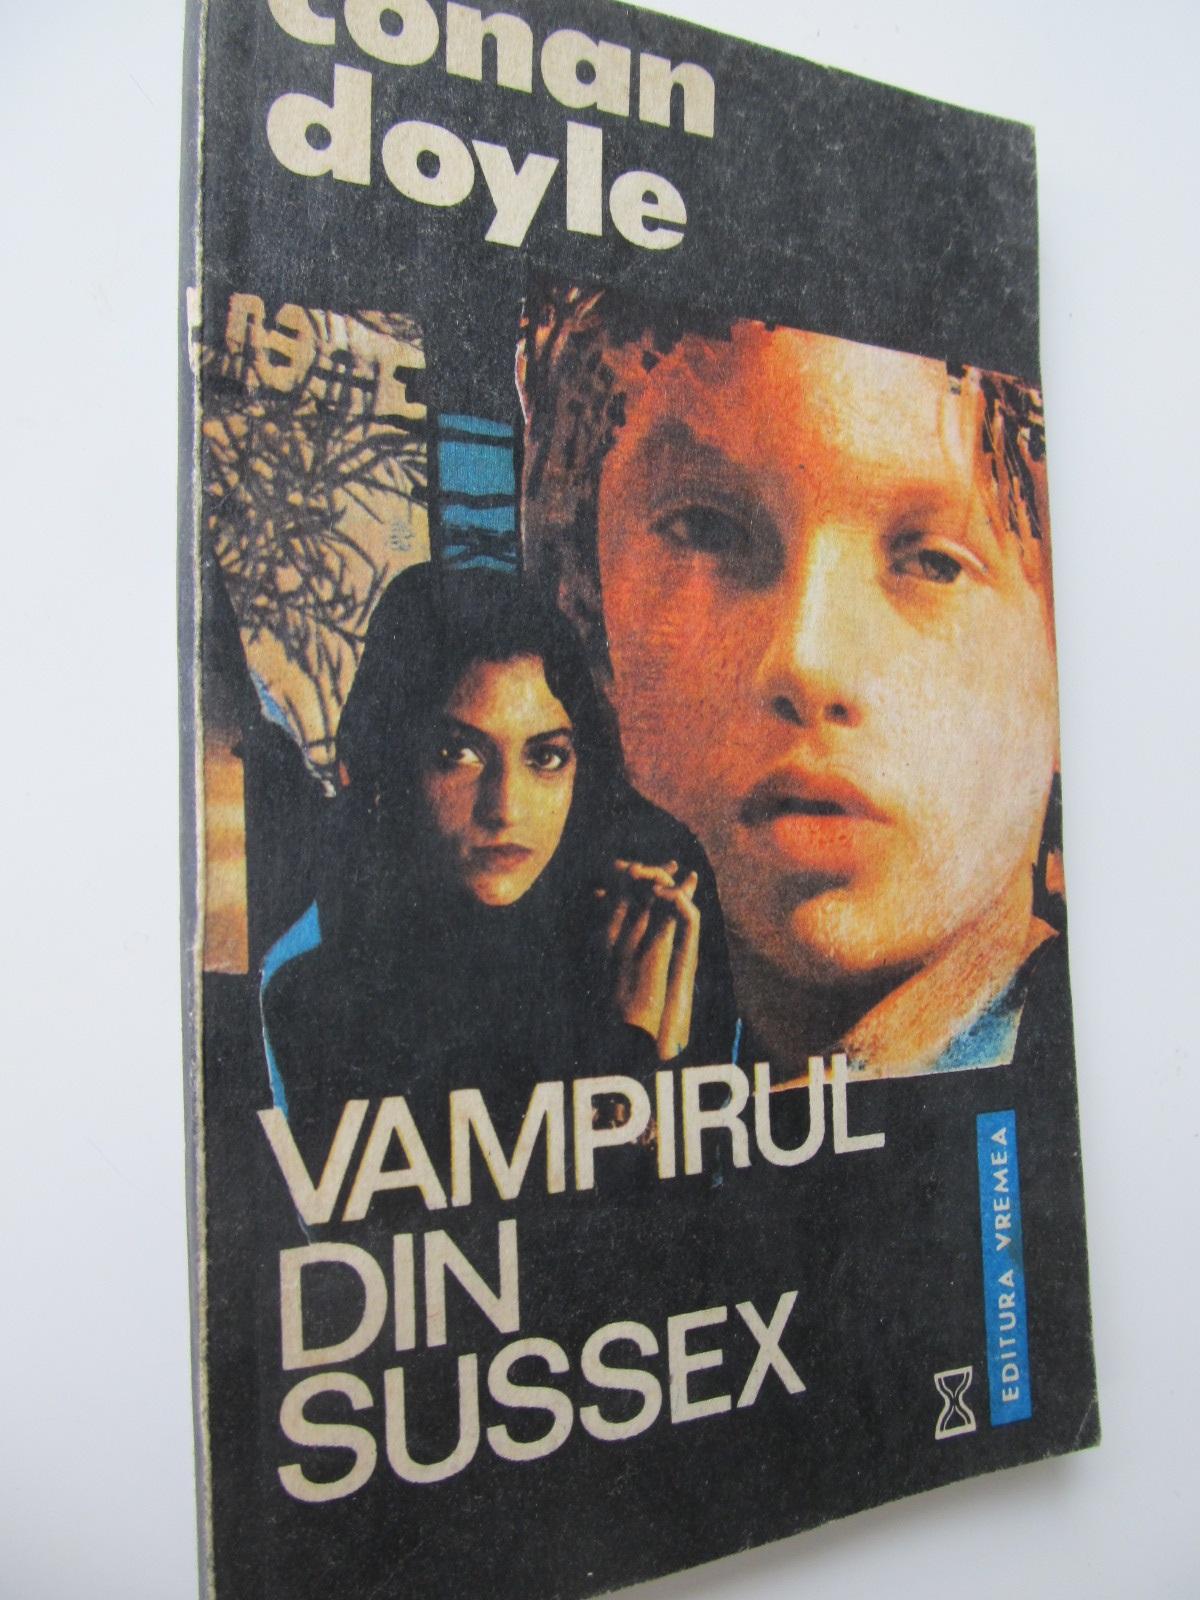 Vampirul din Sussex - Conan Doyle | Detalii carte